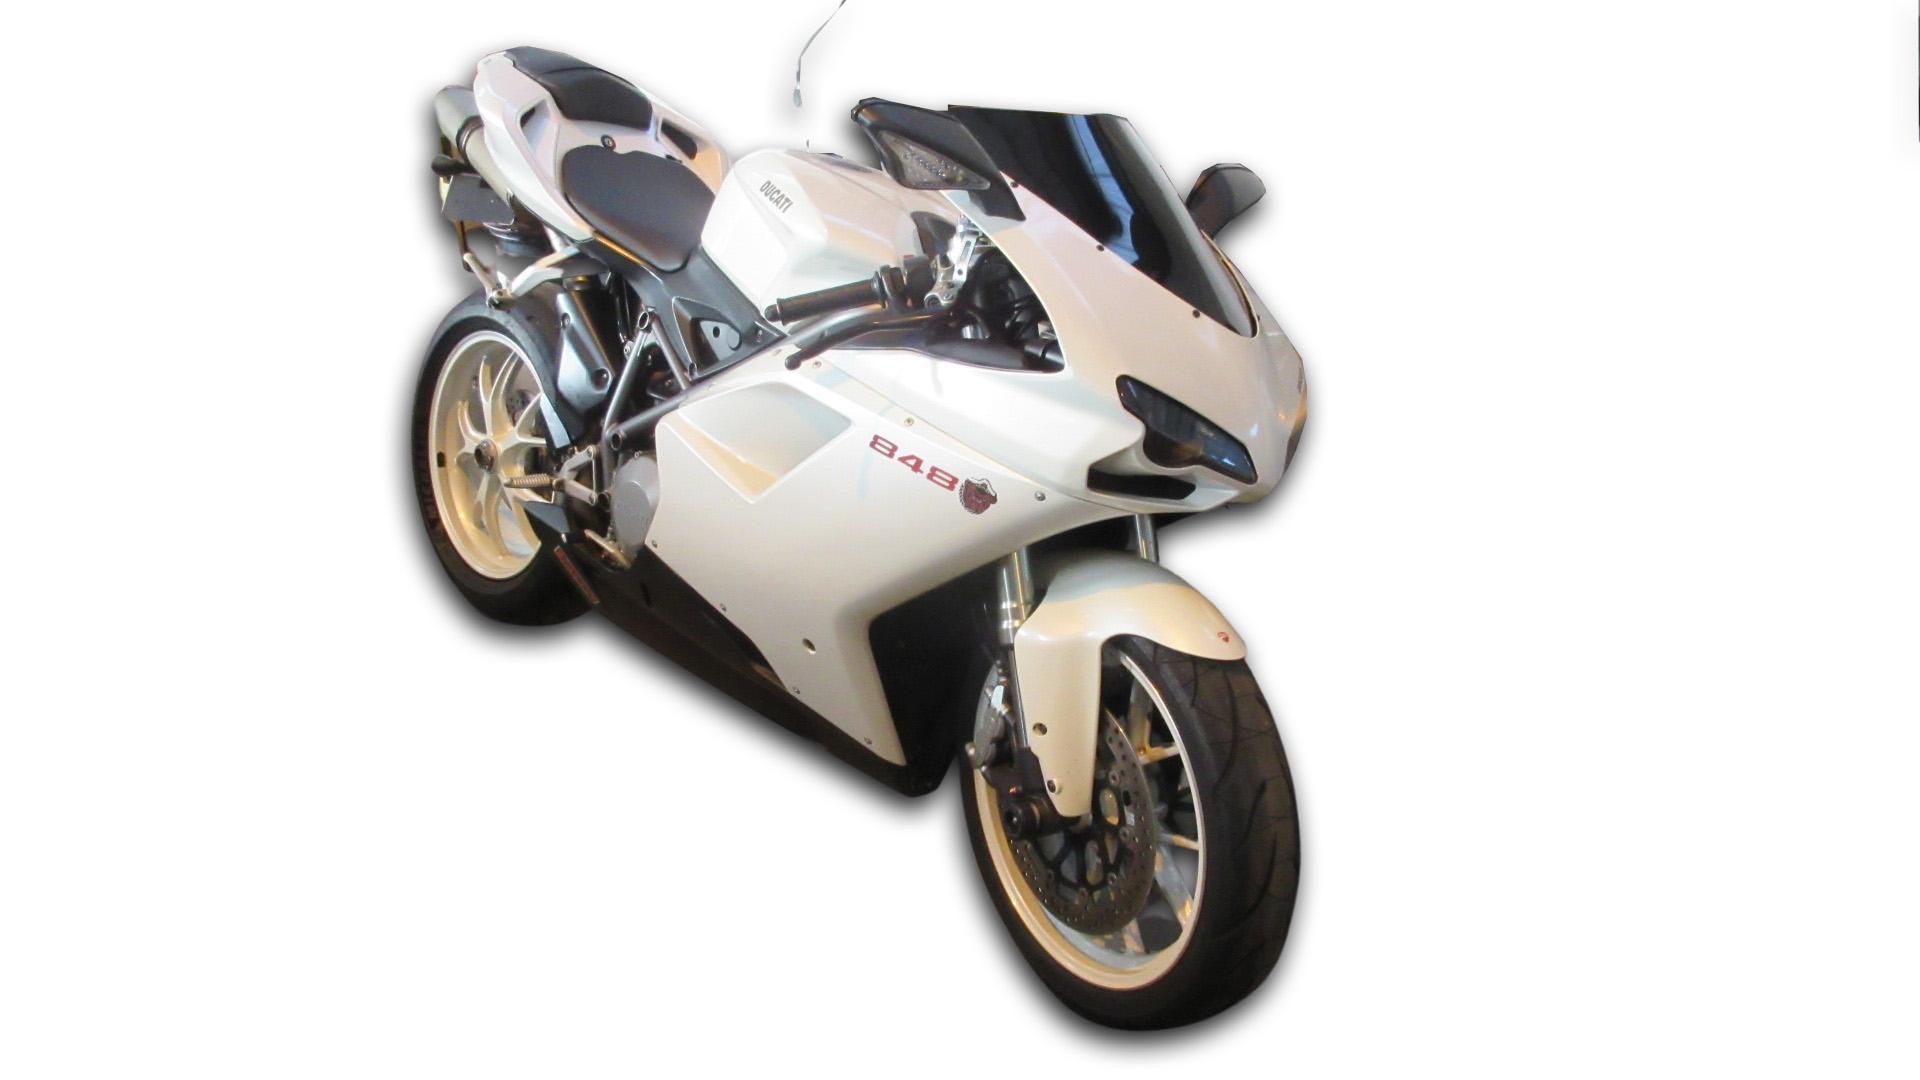 Ducati Motorcycle 1098 S 848 Evo